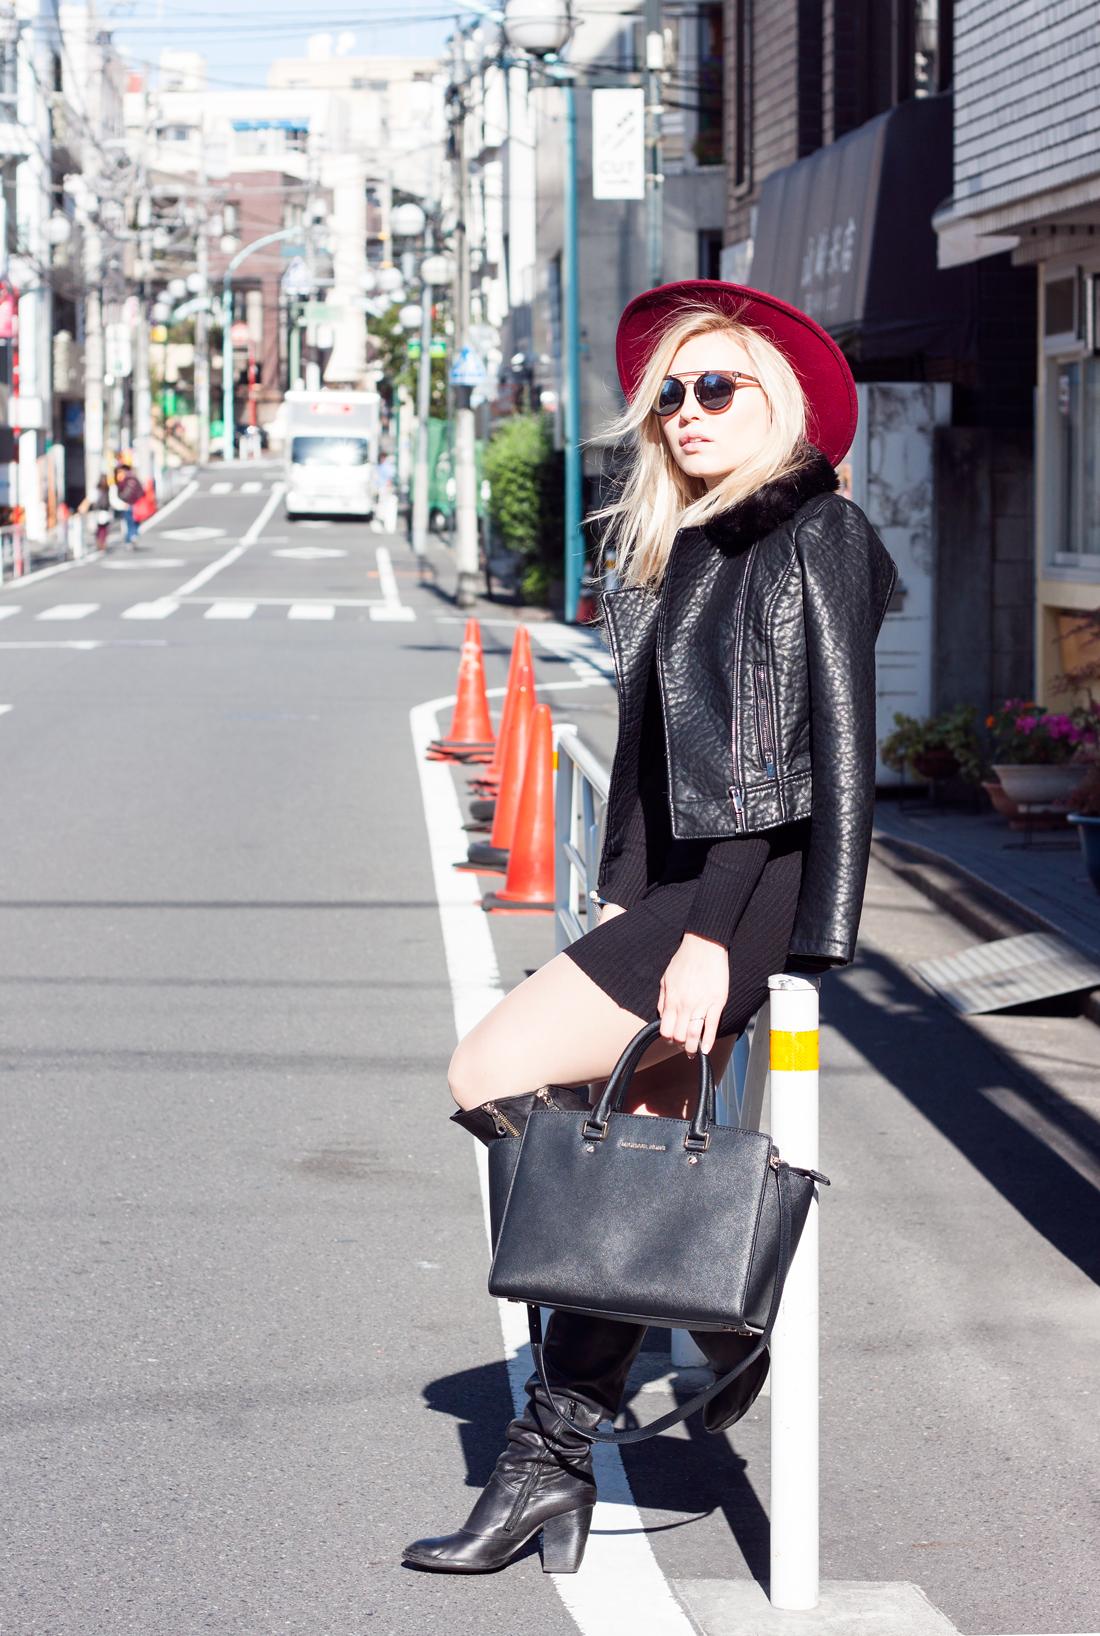 Tokyo, Japan, tokyo fashion, tokyo blog, red fedora hat, swedish girl in tokyo, leather jacket with faux fur, michael kors bag, high knee boots with zippers, kita sando, tokyo bamboo, sunny tokyo